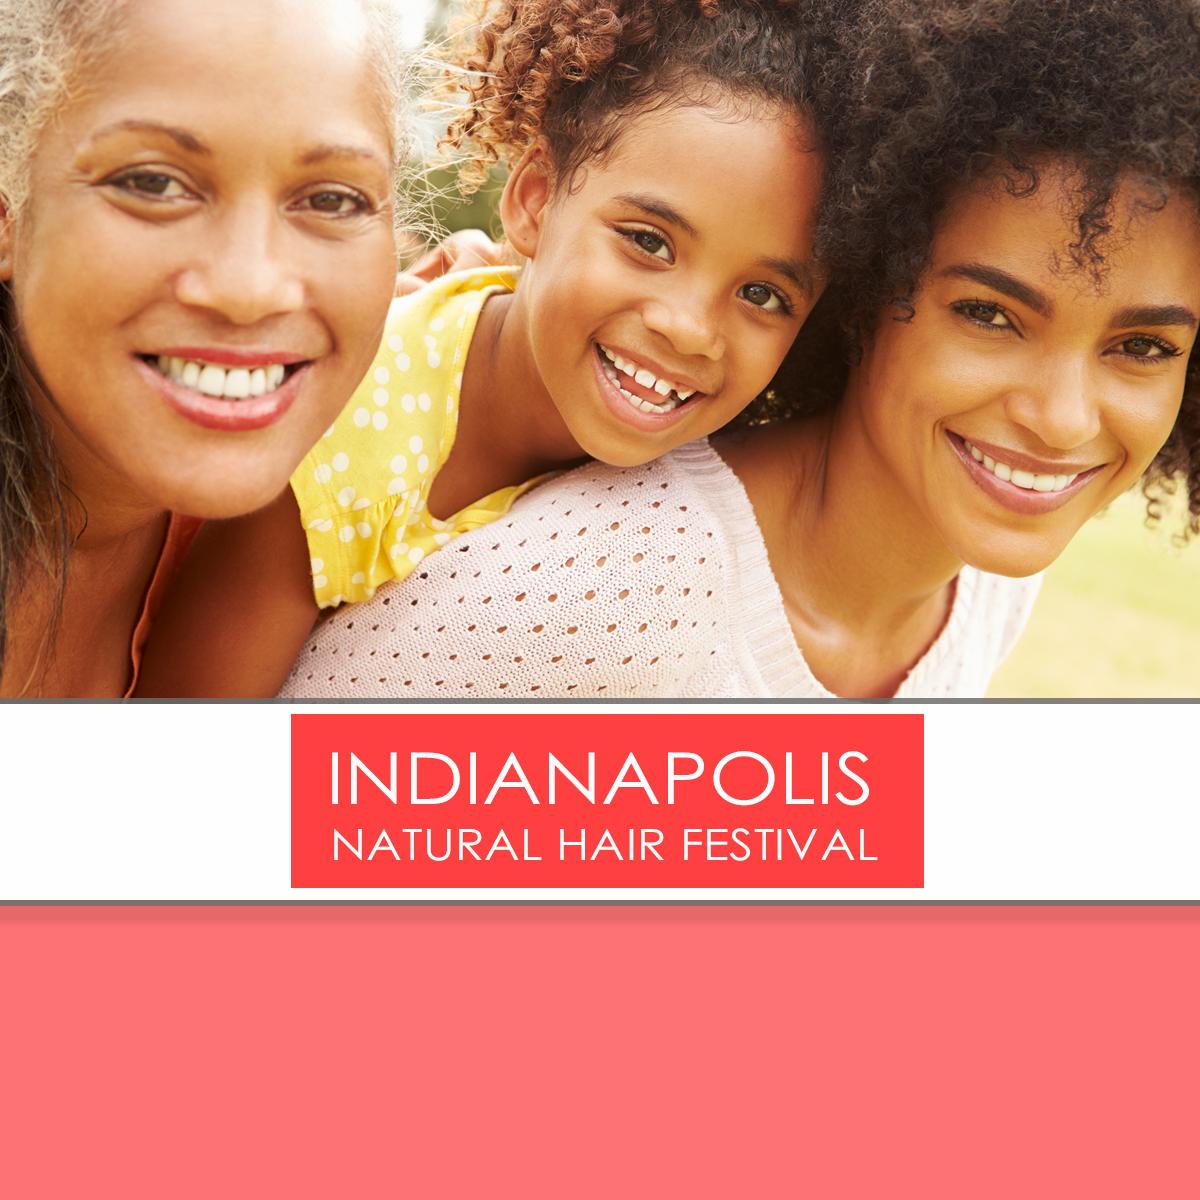 NATURAL HAIR FESTIVAL INDIANAPOLIS